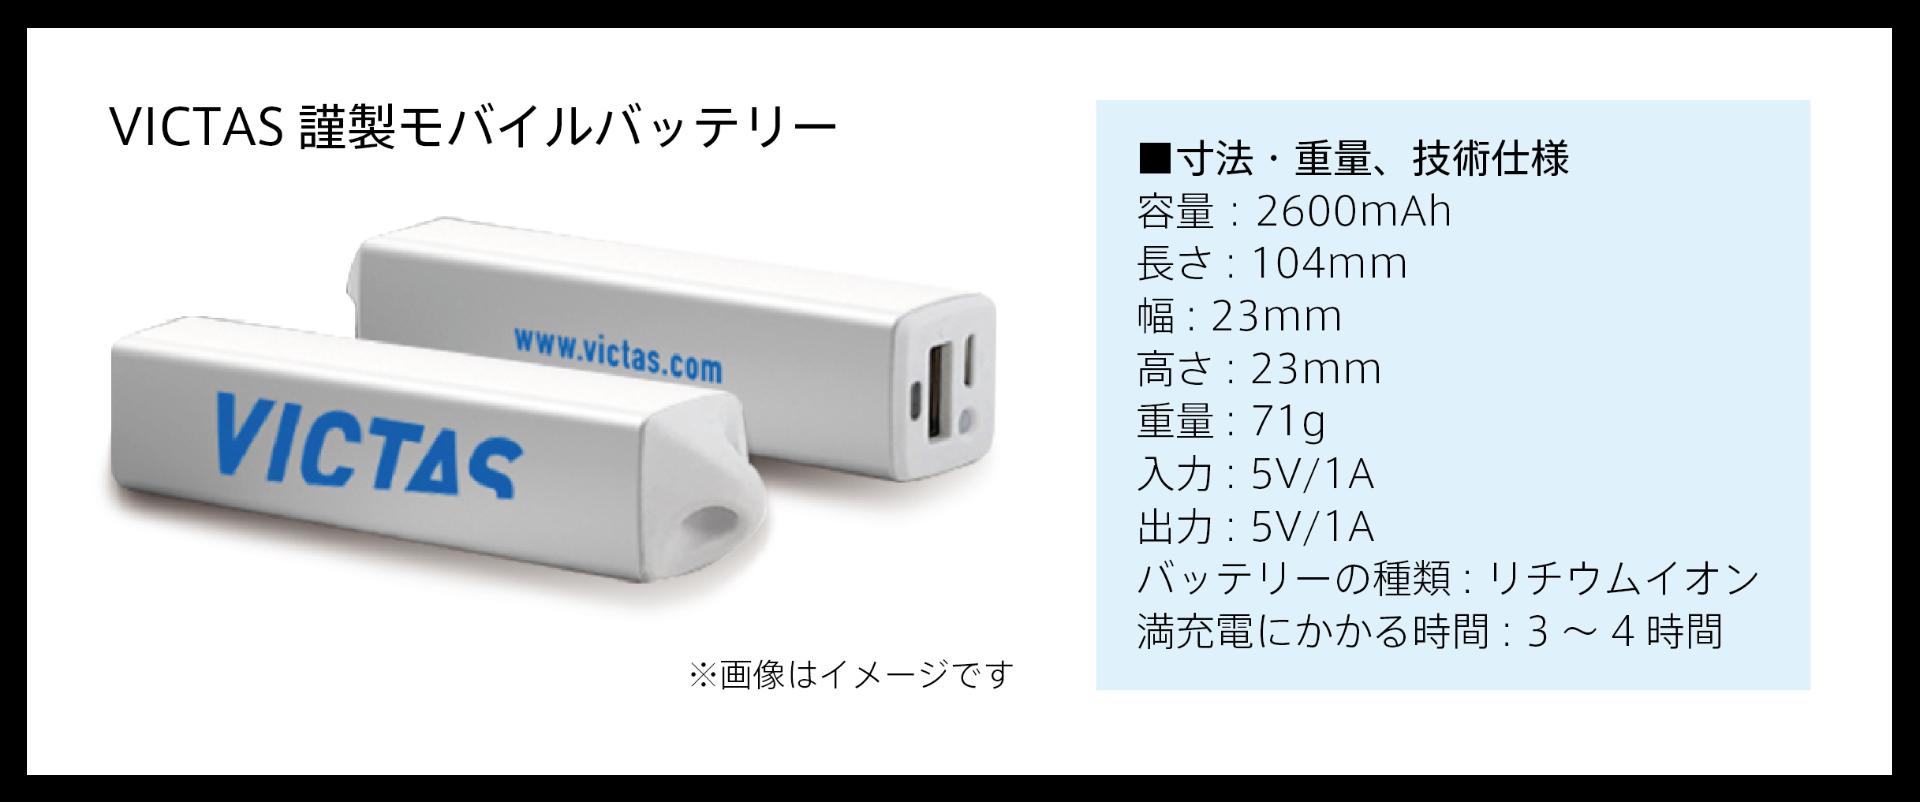 VICTAS謹製モバイルバッテリー